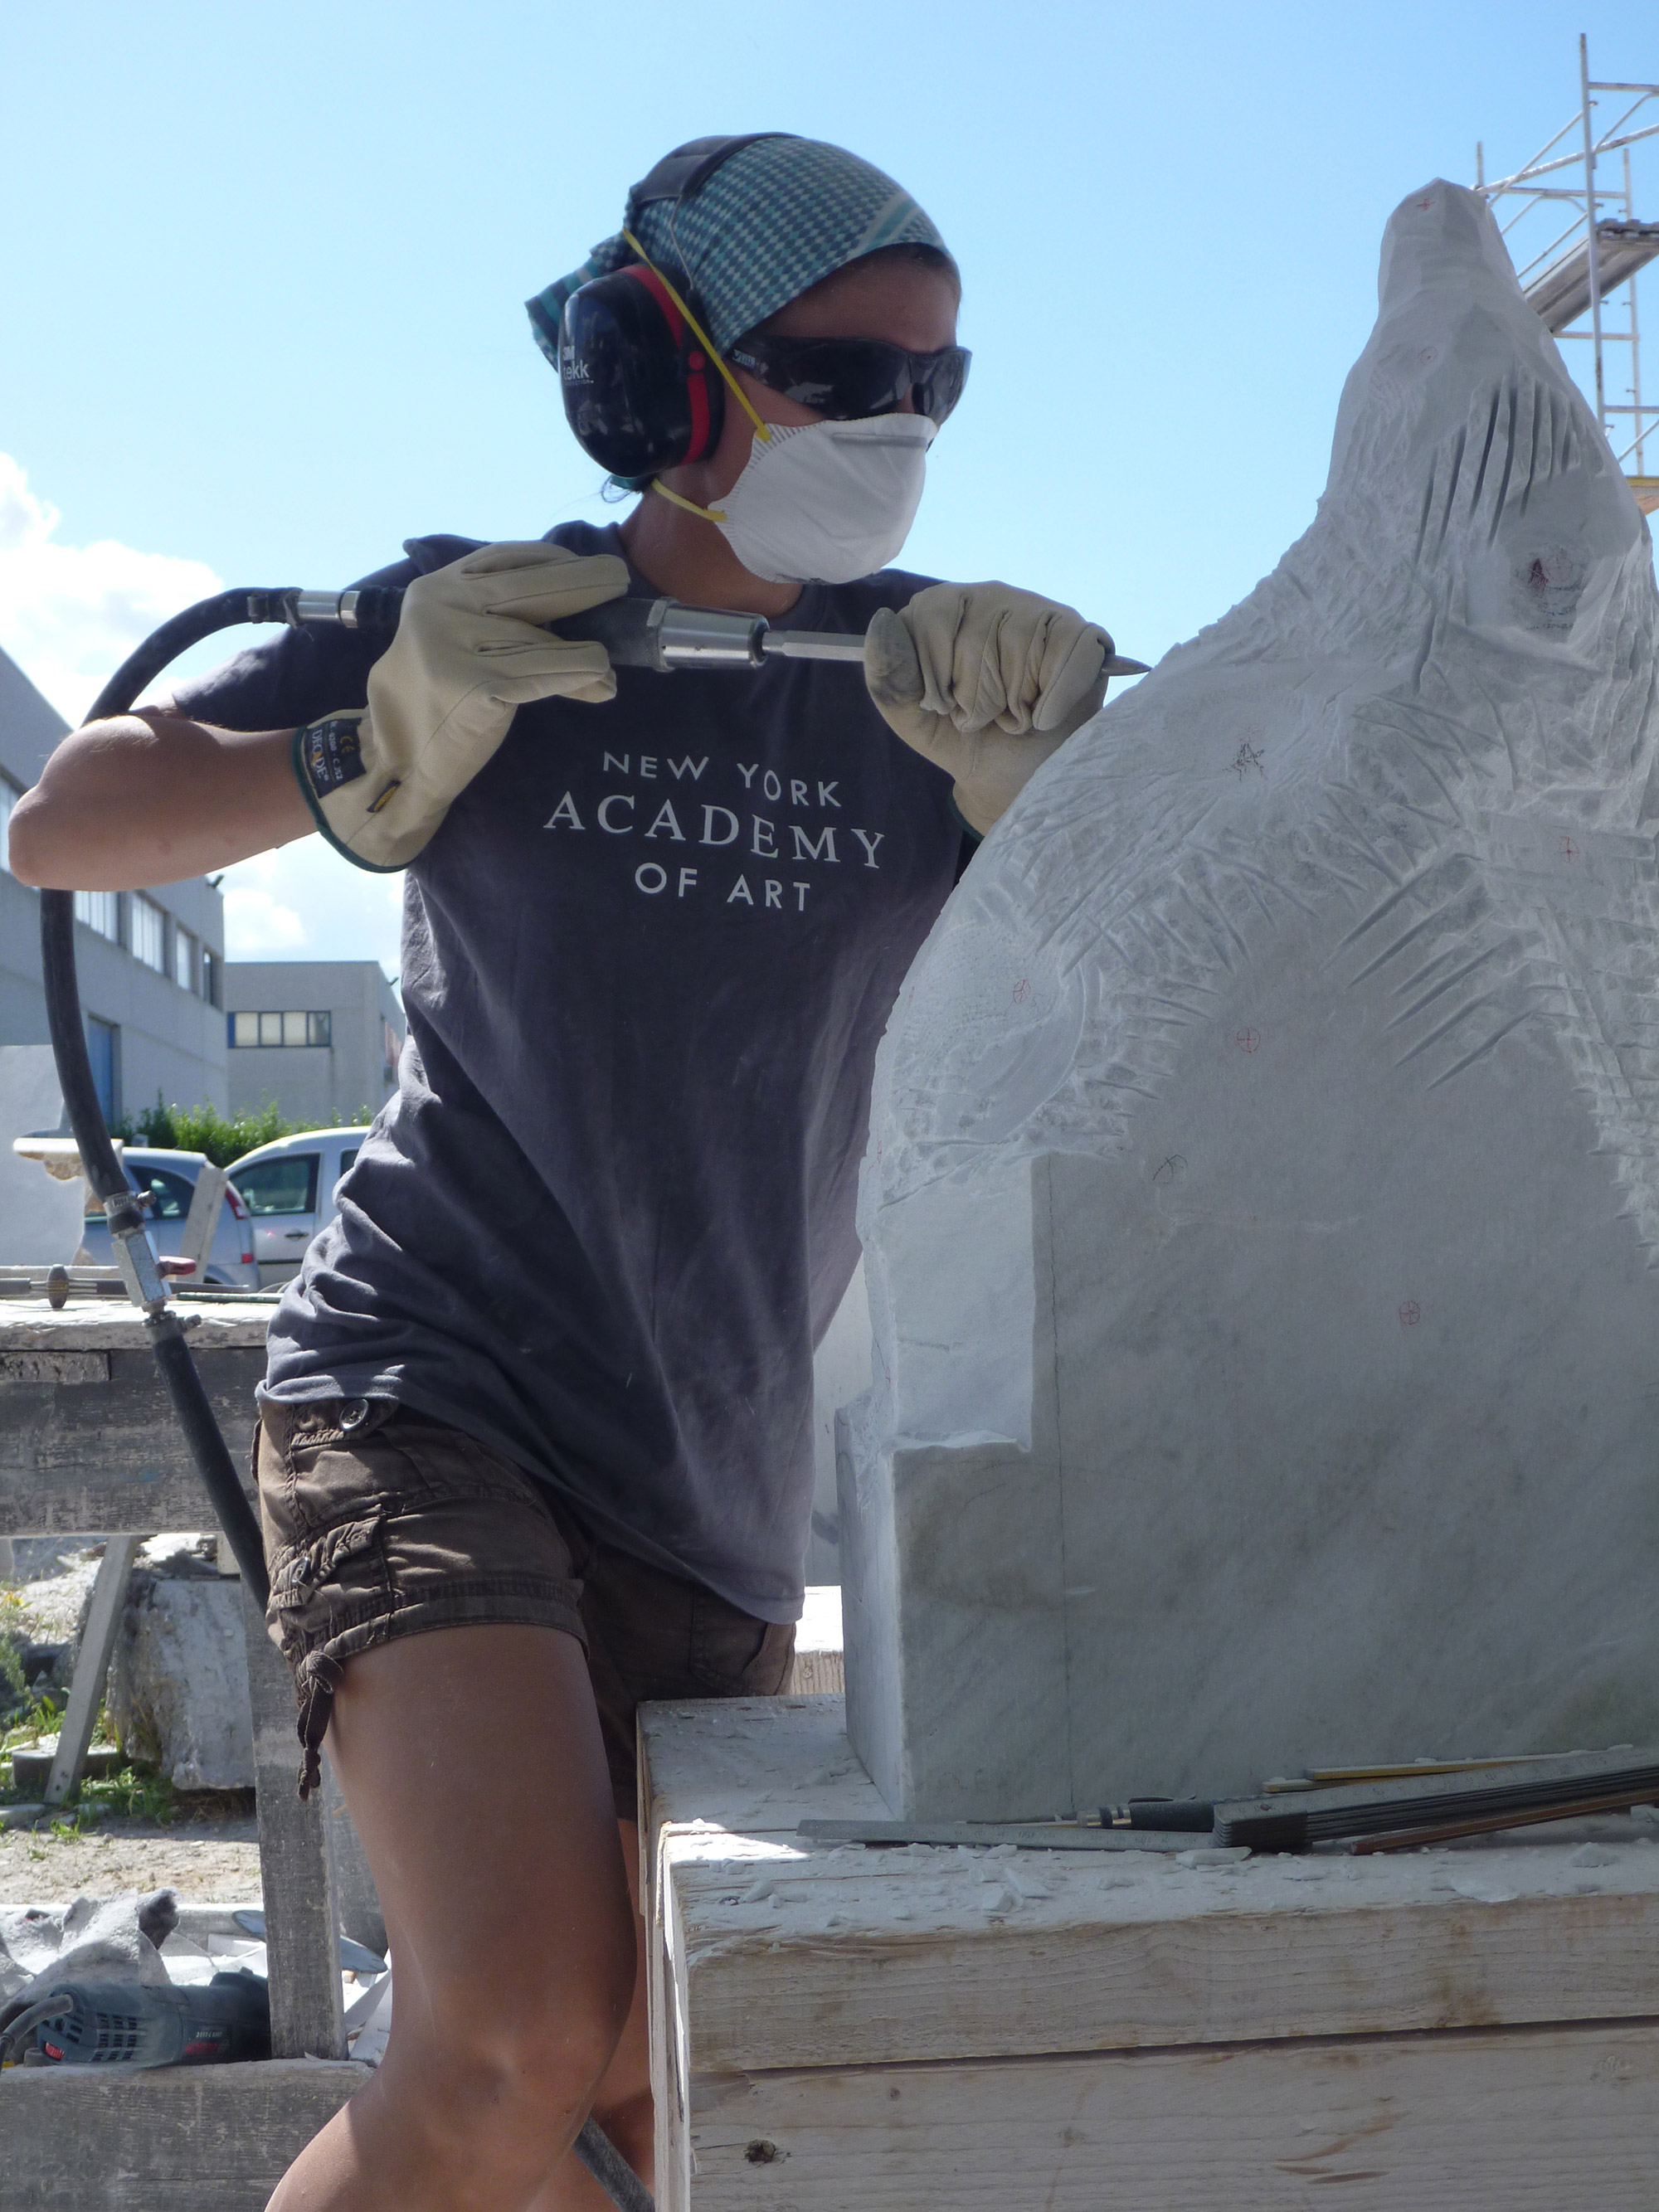 New-York-Academy-of-Art-Carrara-Residency-Heather-Personett-Zoe-Suenson-Taylor20171213_0062.jpg